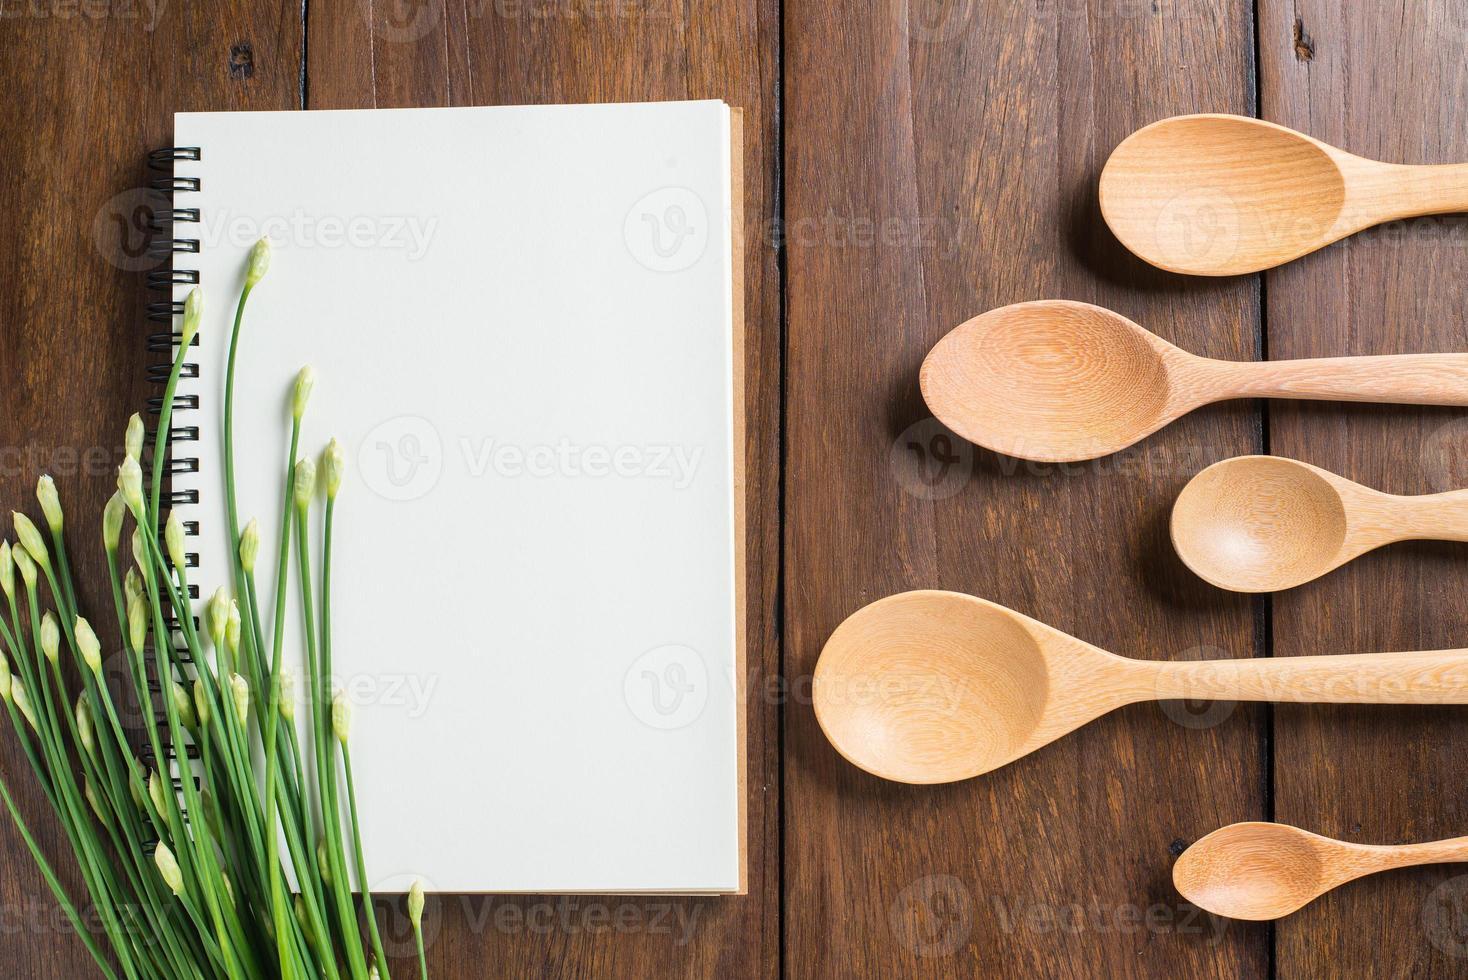 recept notebook, lepel, vork op houten achtergrond foto